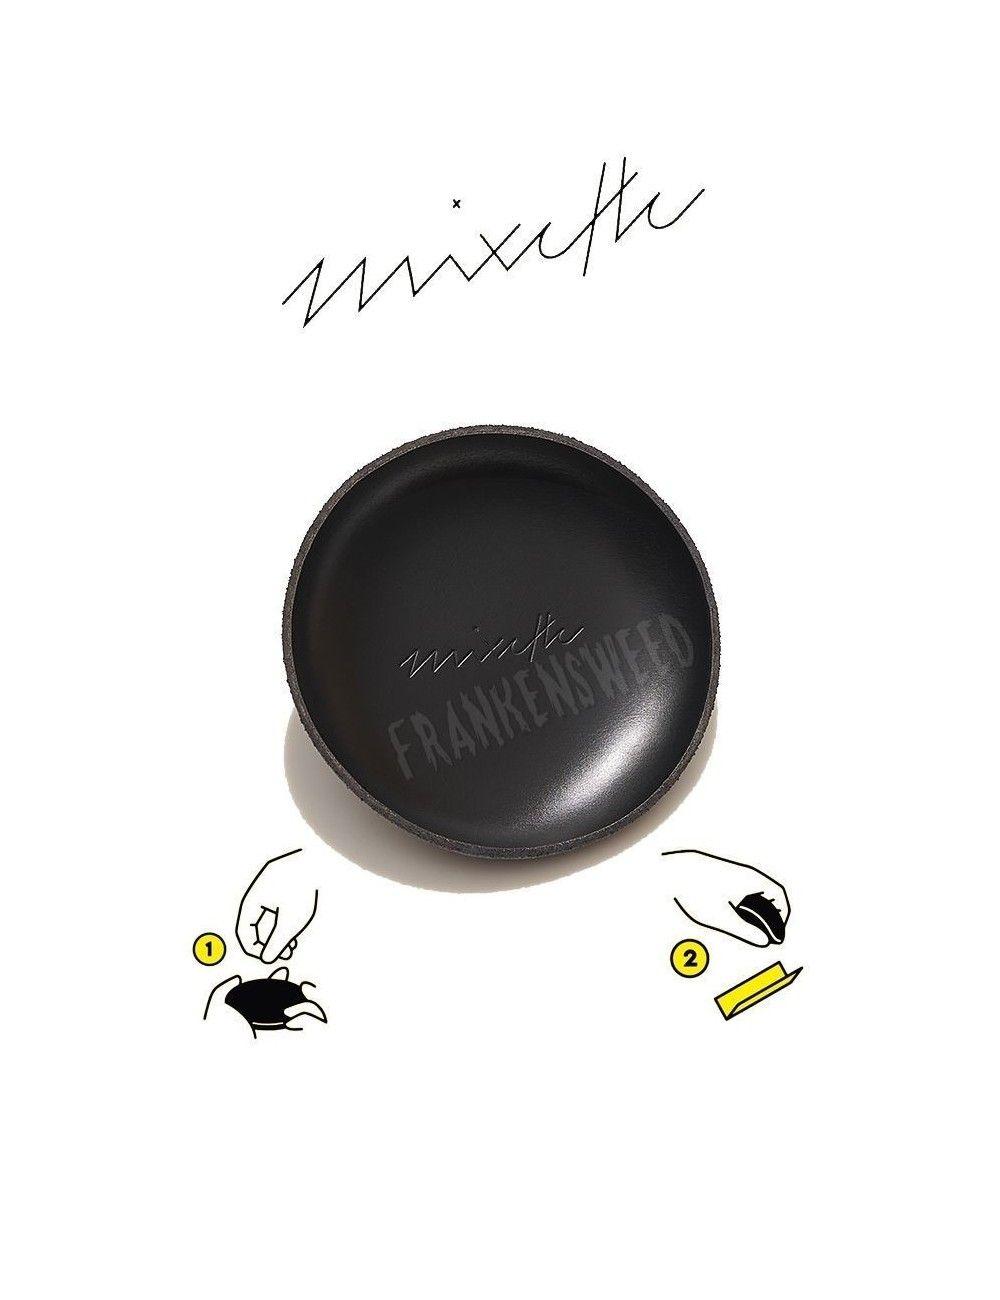 La Mixette XL